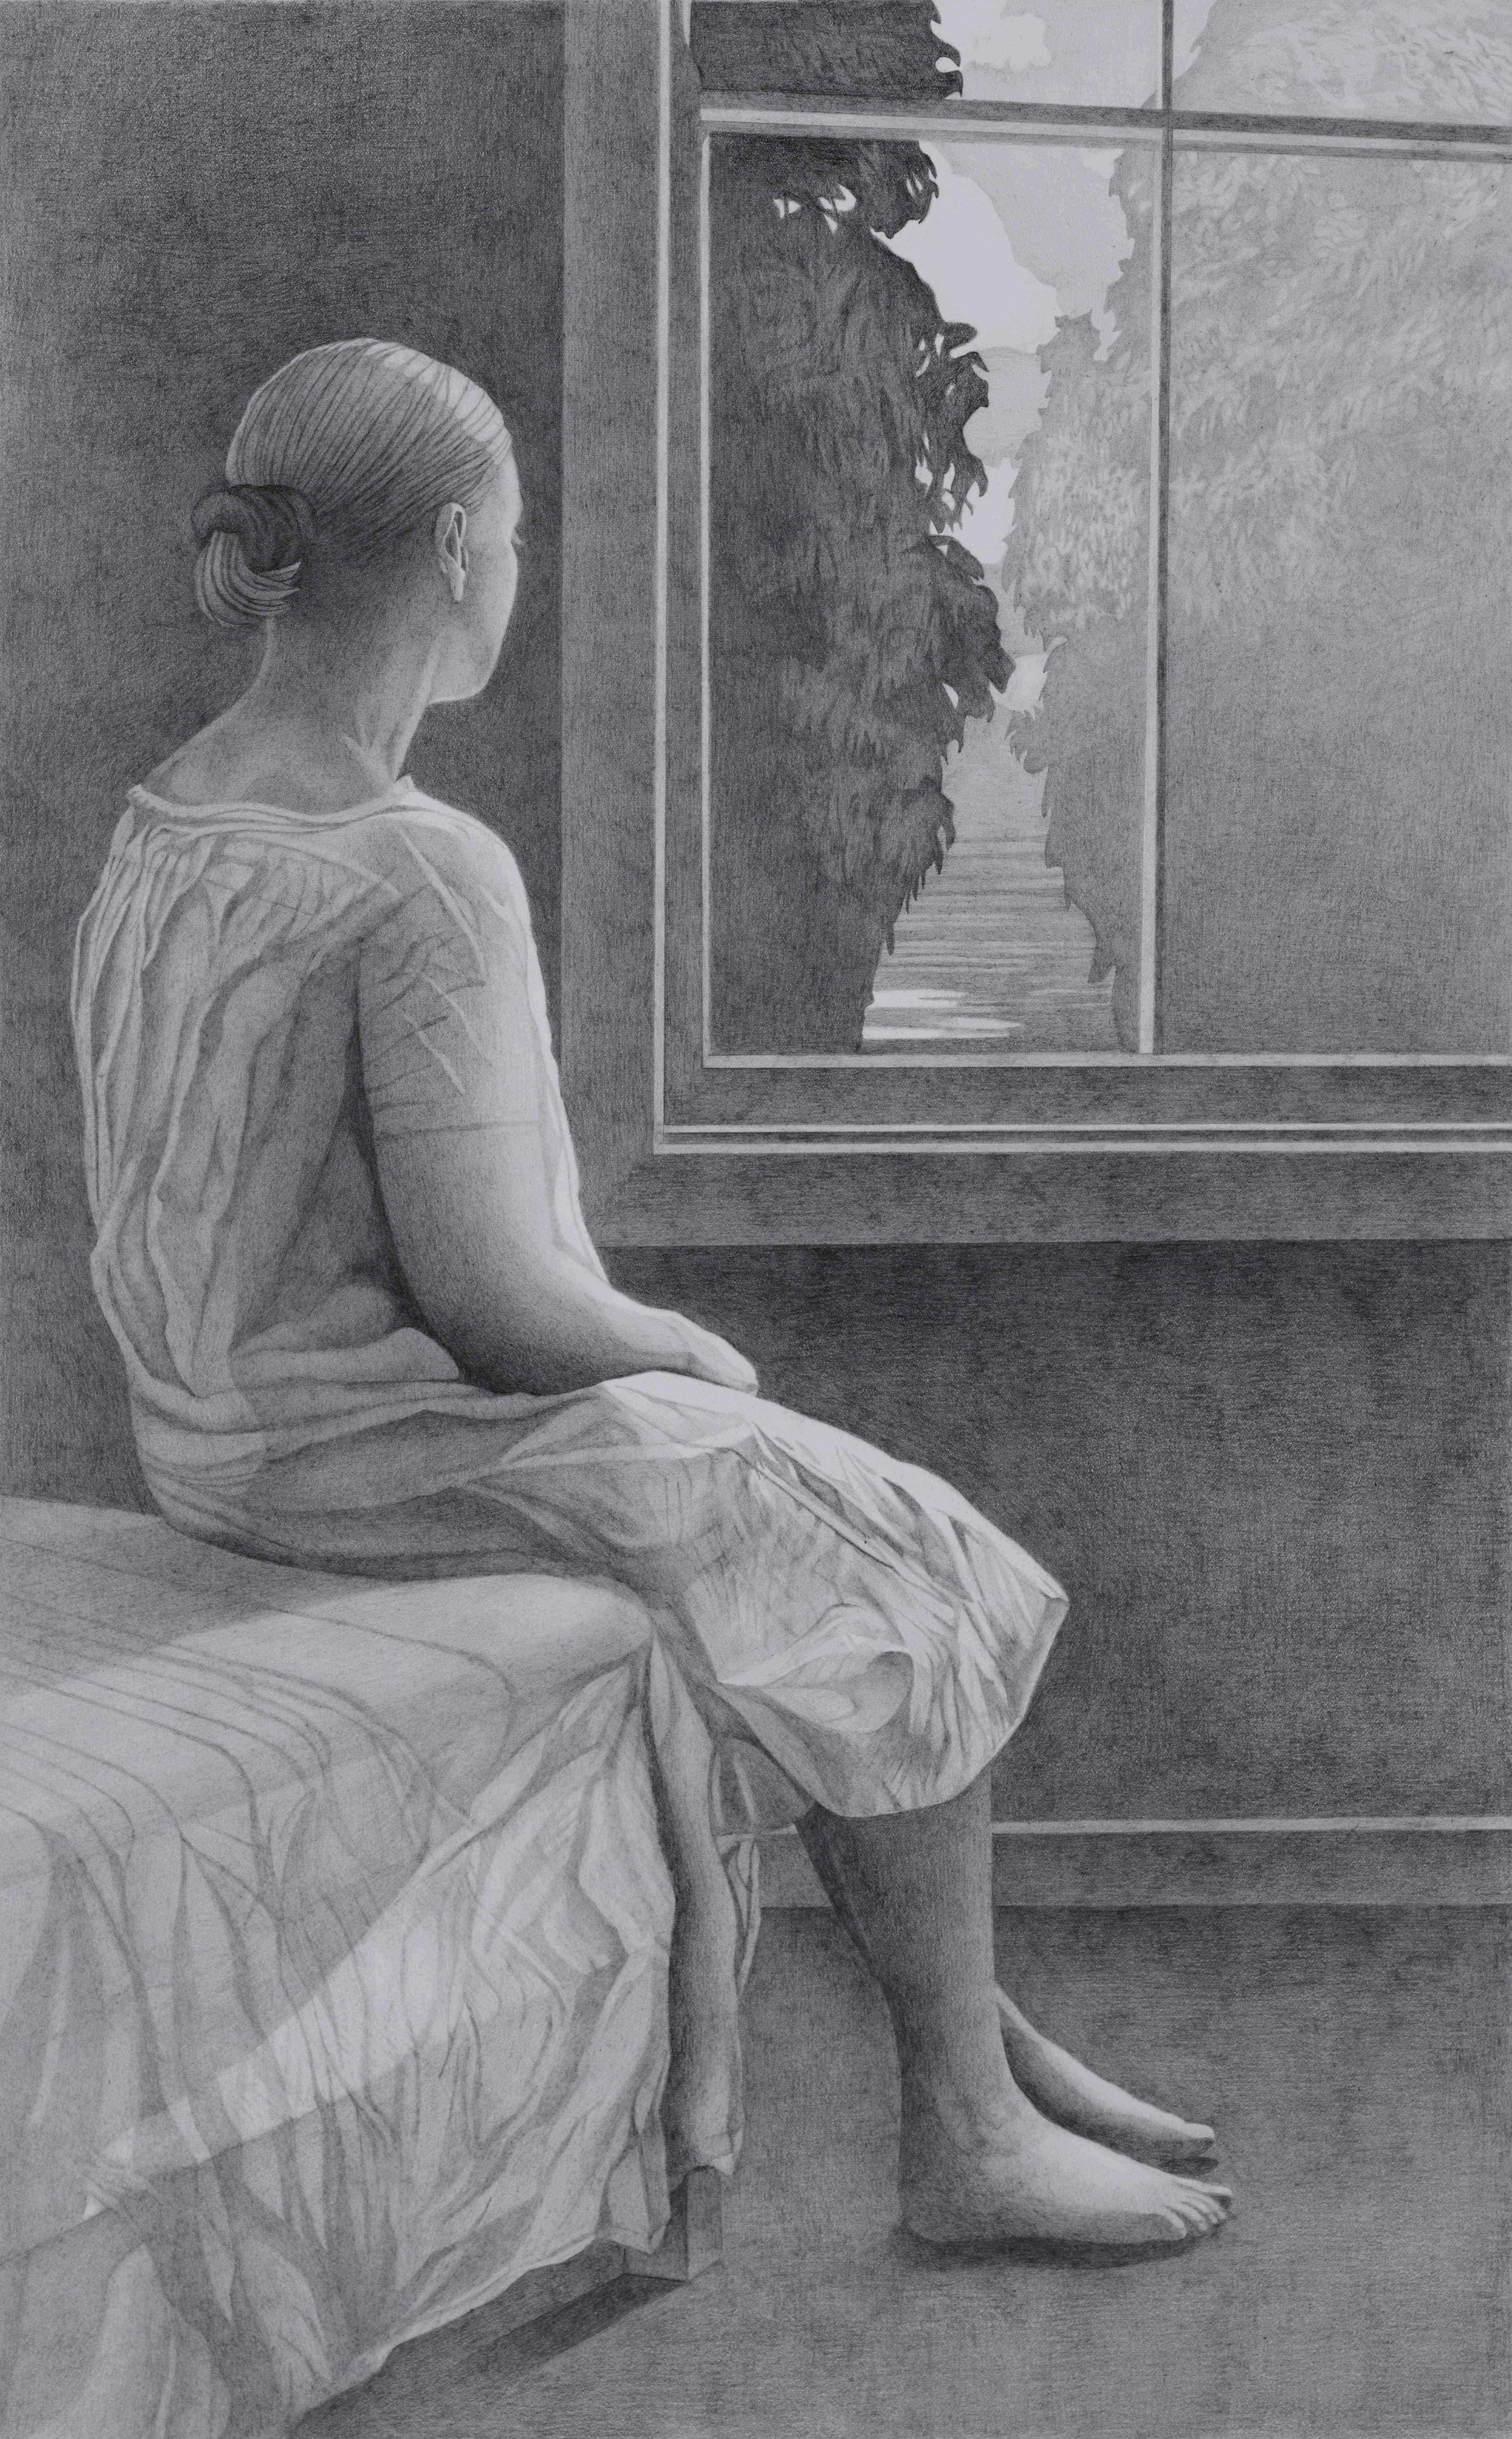 Paul Hogg, Woman at a Window, Pencil on paper, 54cmx34cm,  http://paul-hogg.com